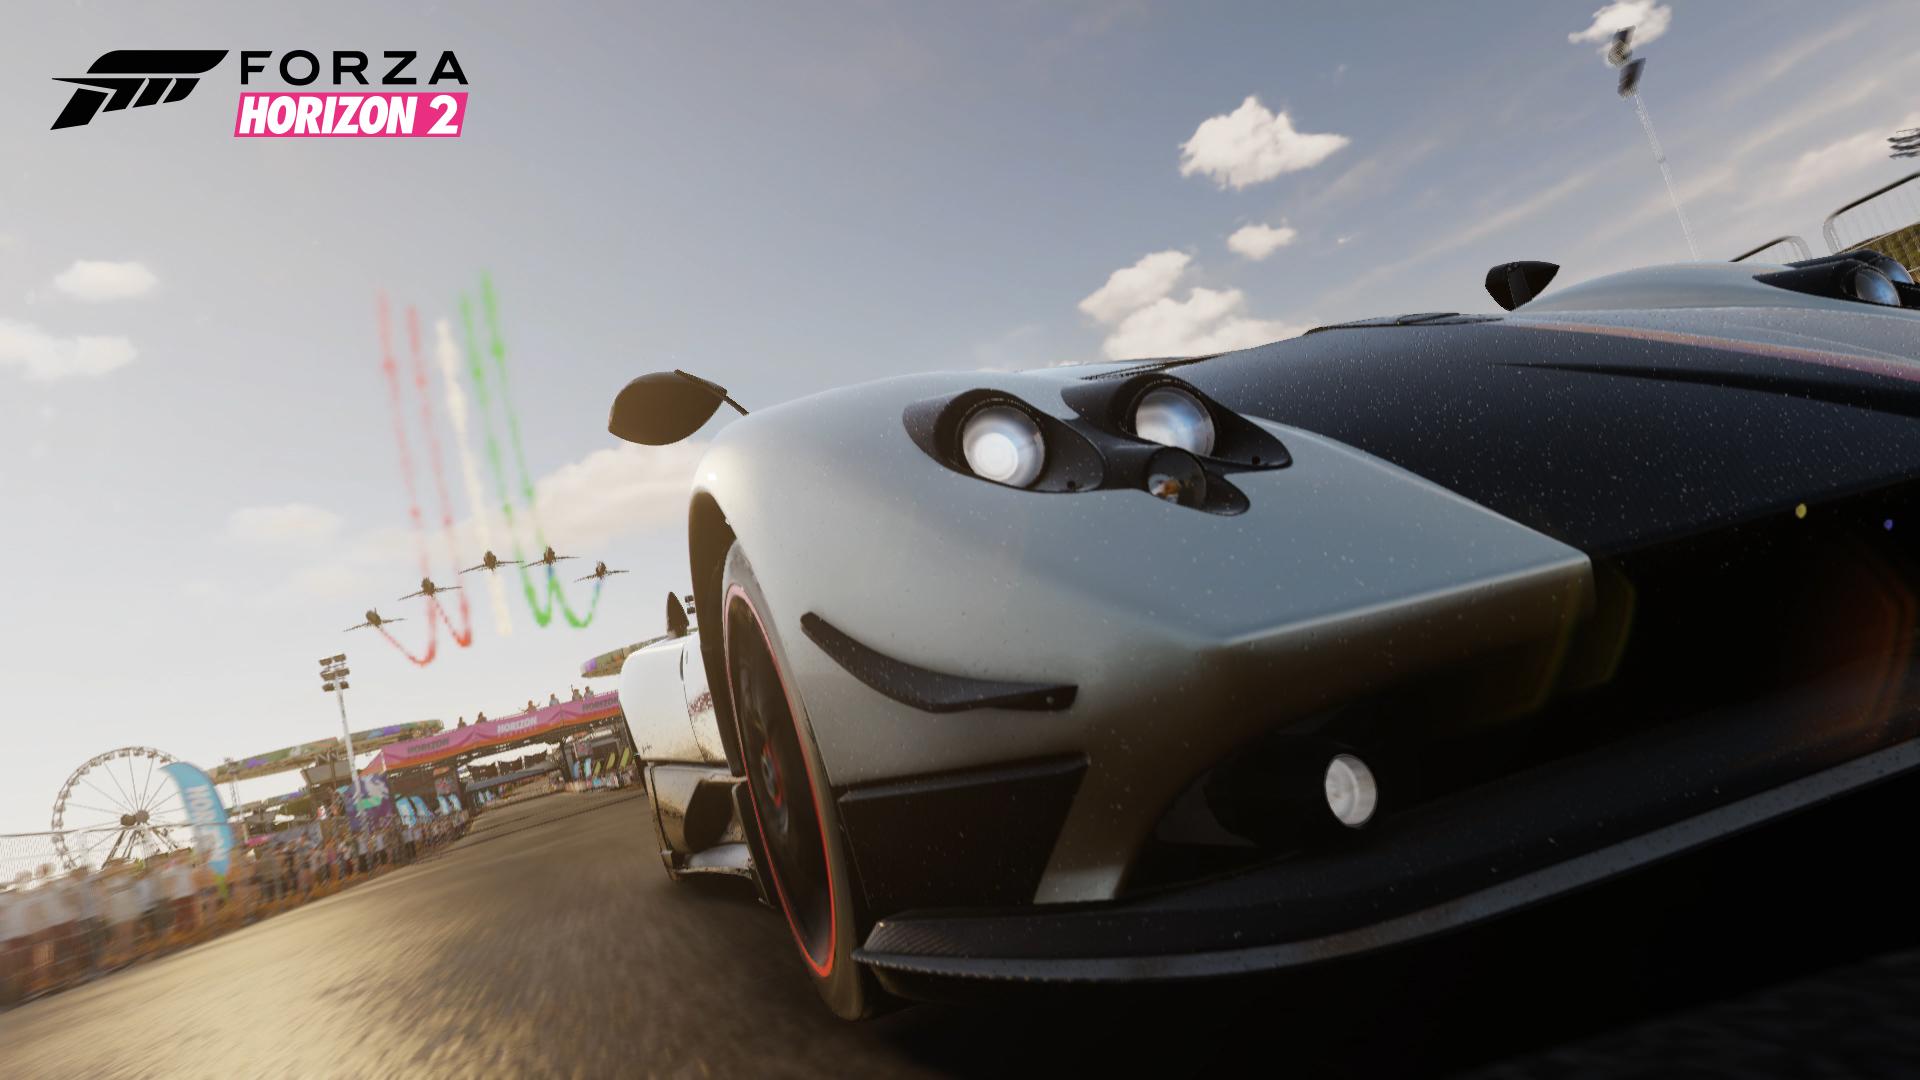 Official - Forza Horizon 2 - Xbox Lobby Car Club & Discussion Thread